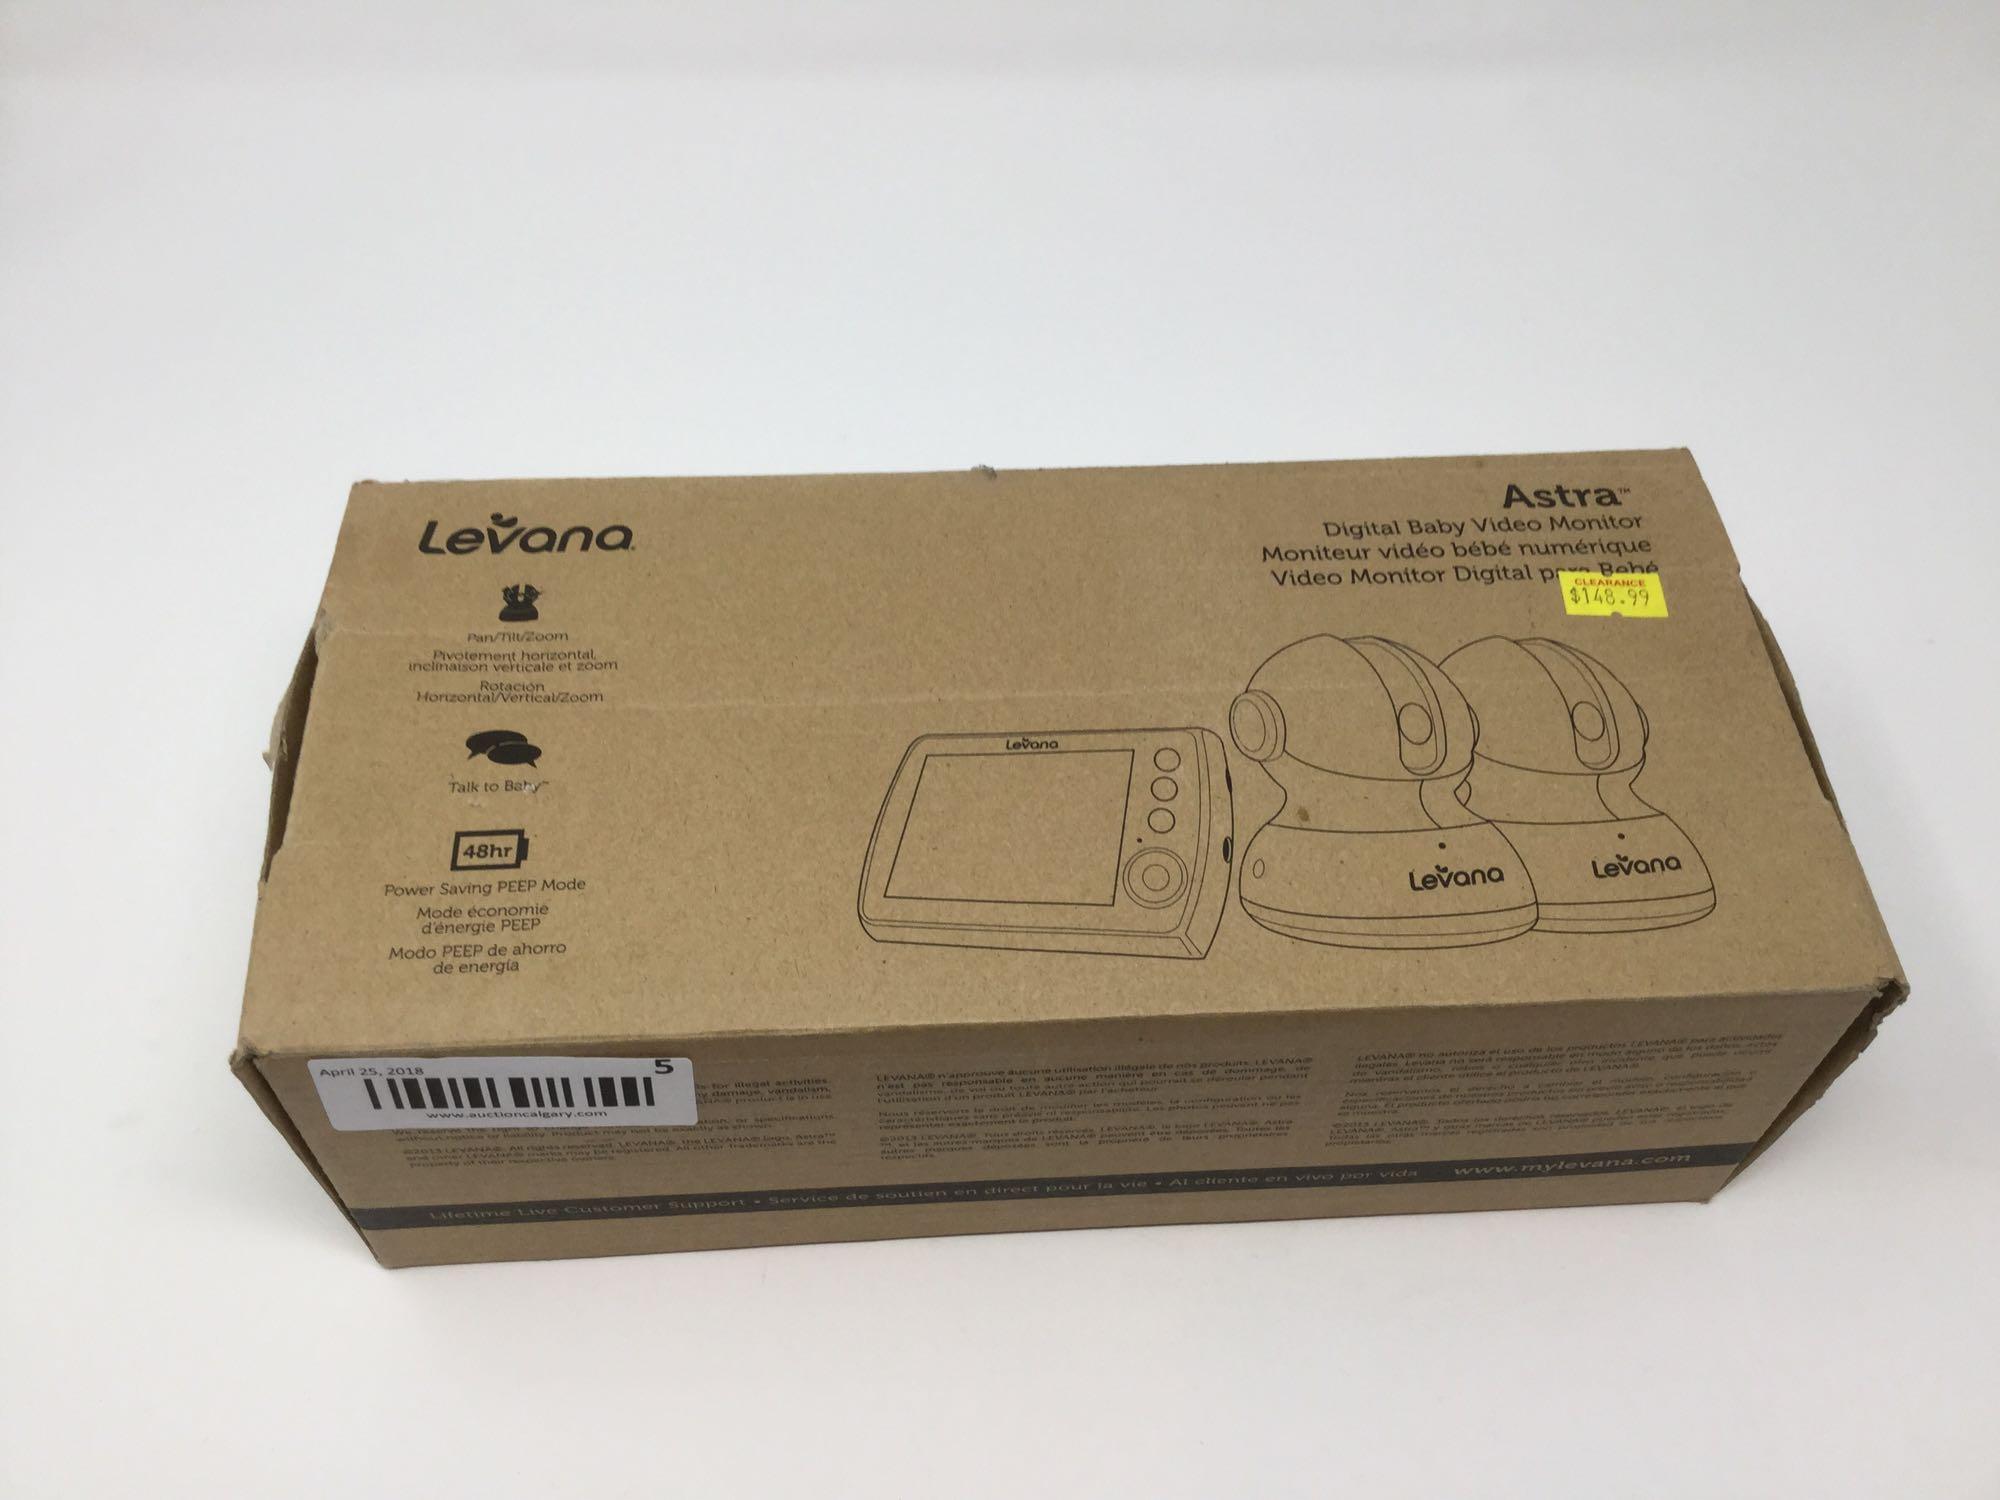 Lot 5 - Levana- Astra Digital Baby Video Monitor